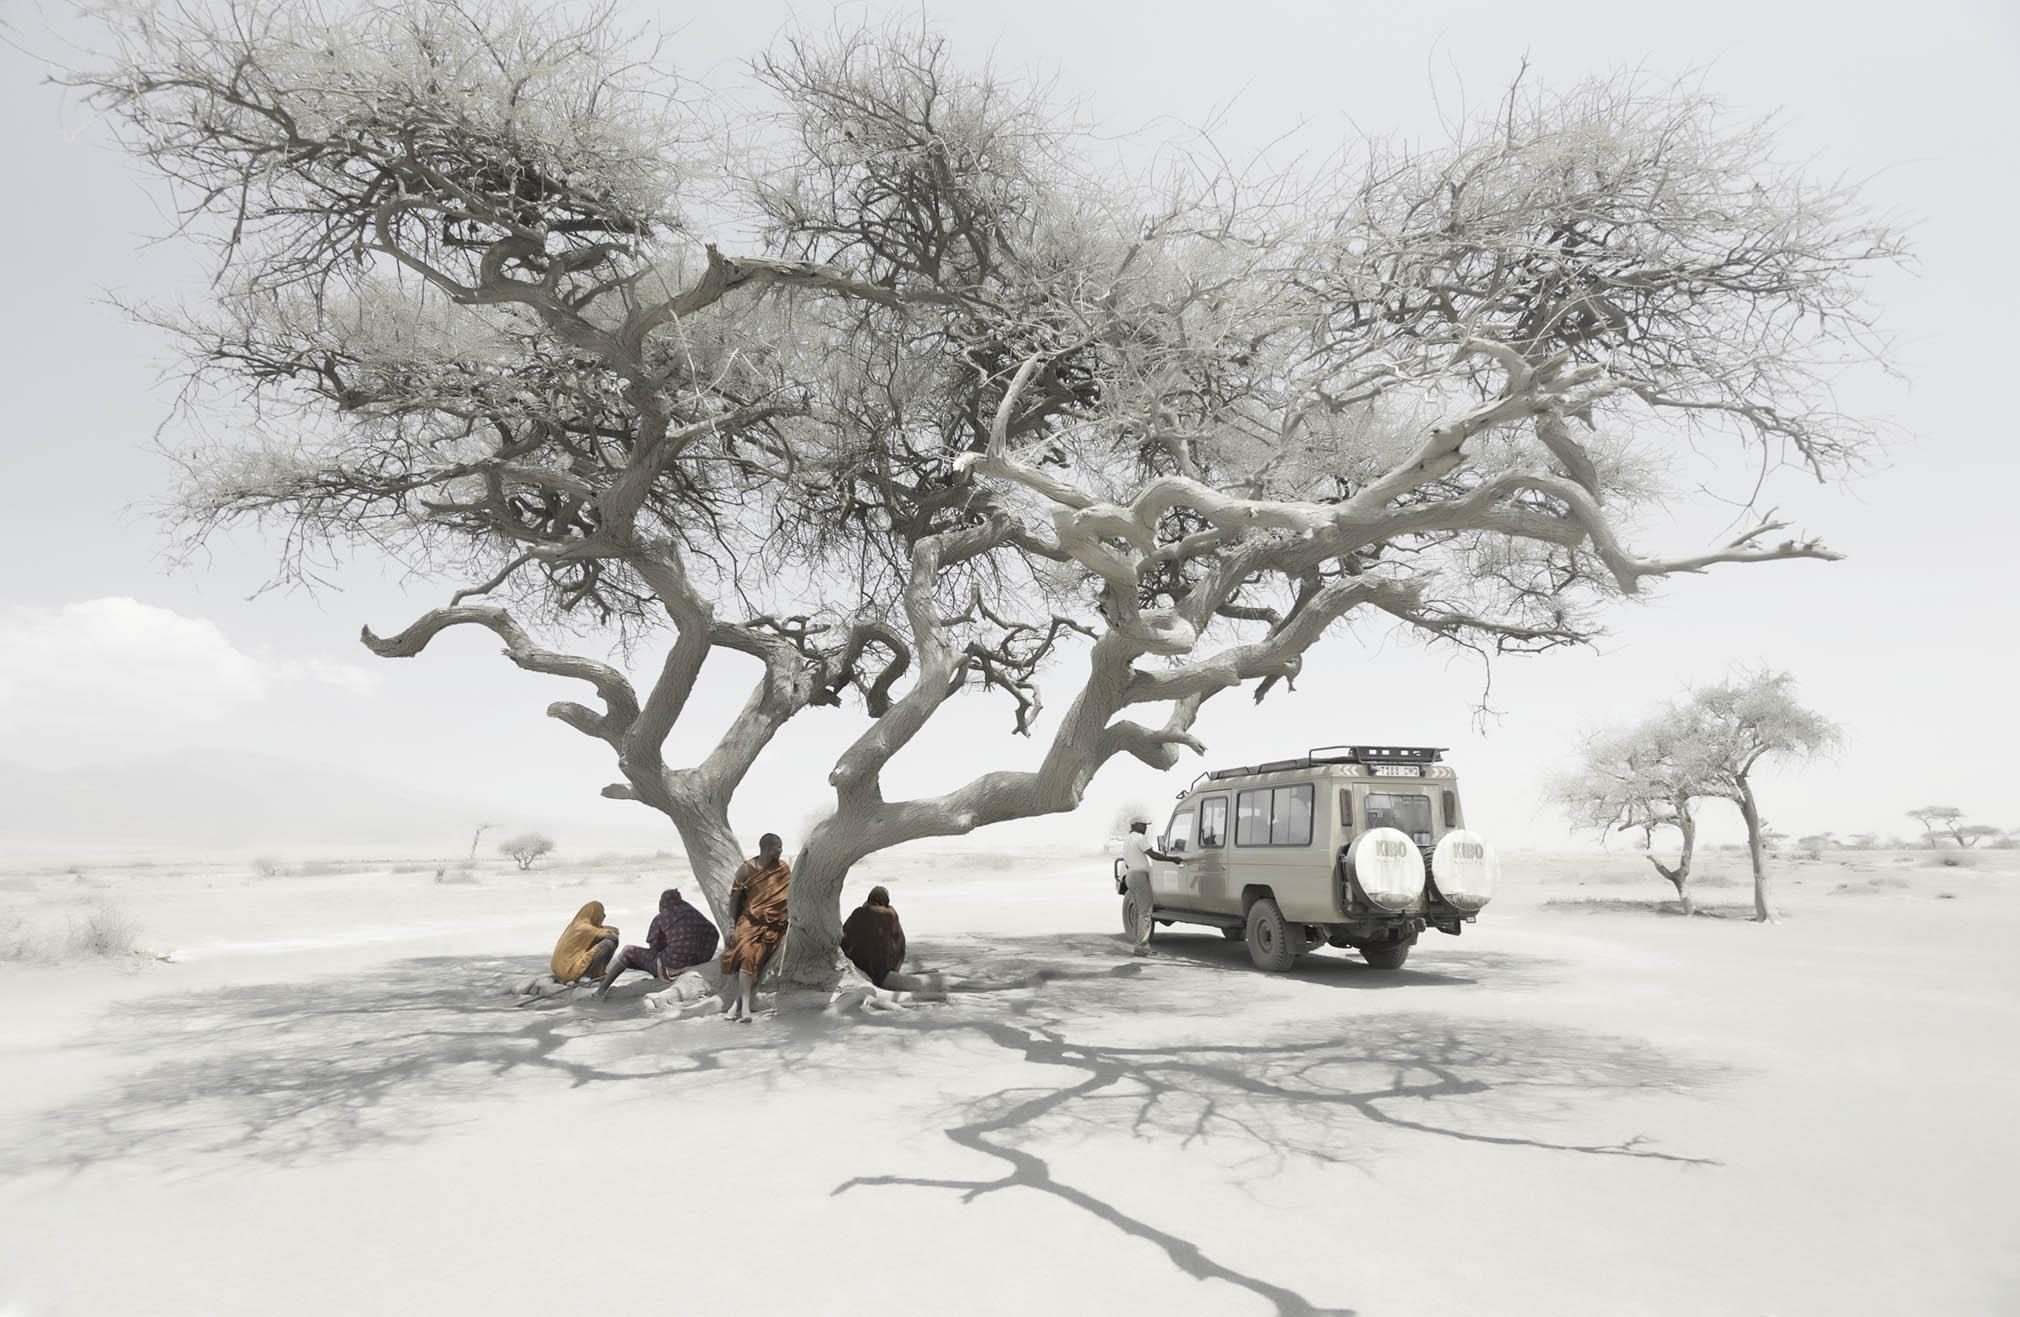 África Oriental II (2015) - Miguel Ángel Gómez Sanz - Miguel Ángel Gómez